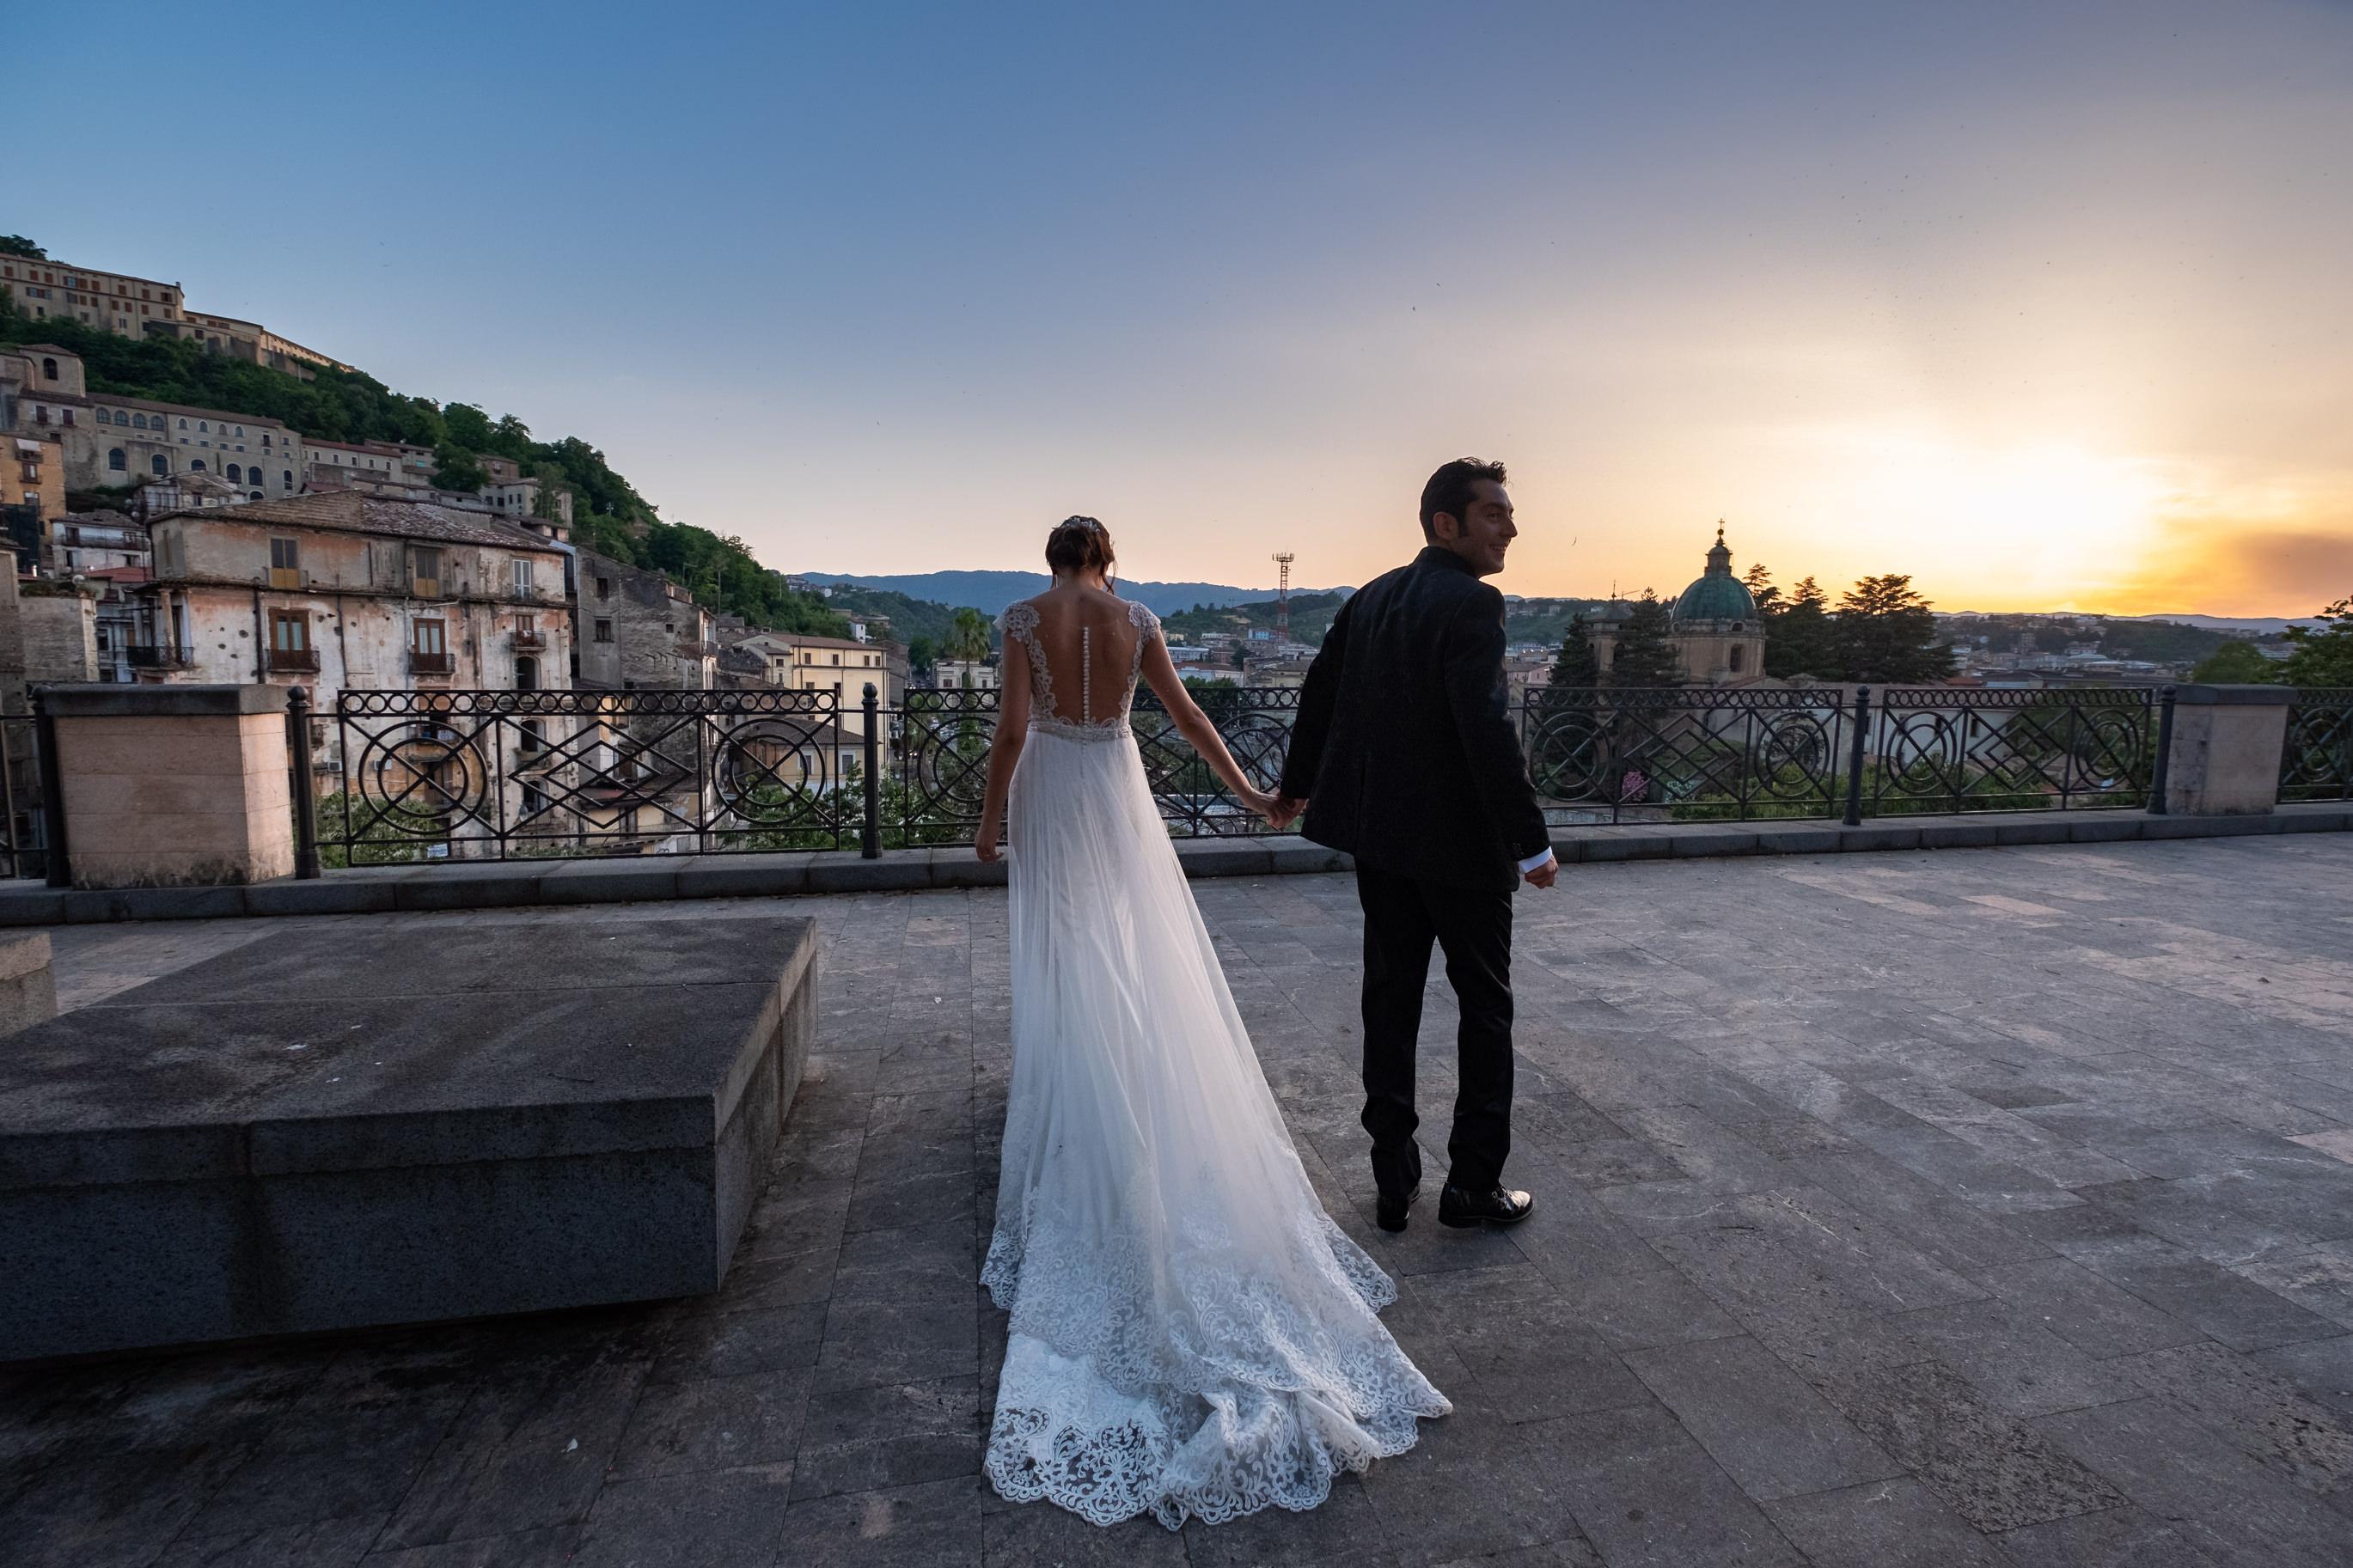 photography wedding reportage italy